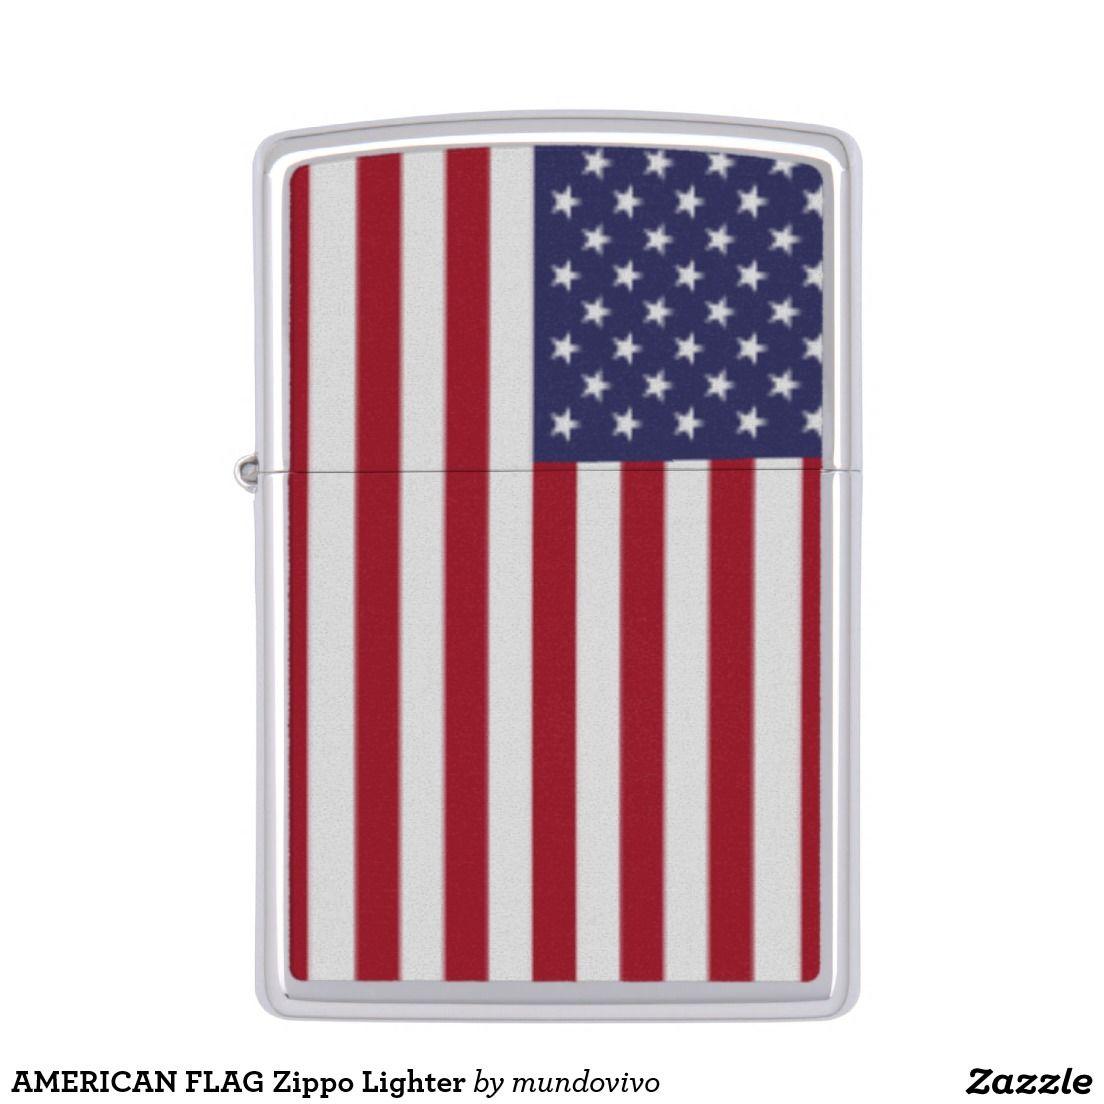 American Flag Zippo Lighter Patriots Usa Americanflag Zippo Lighters Zippolighters Giftsformen Giftsforhim Flag Zippo Lighter American Flag